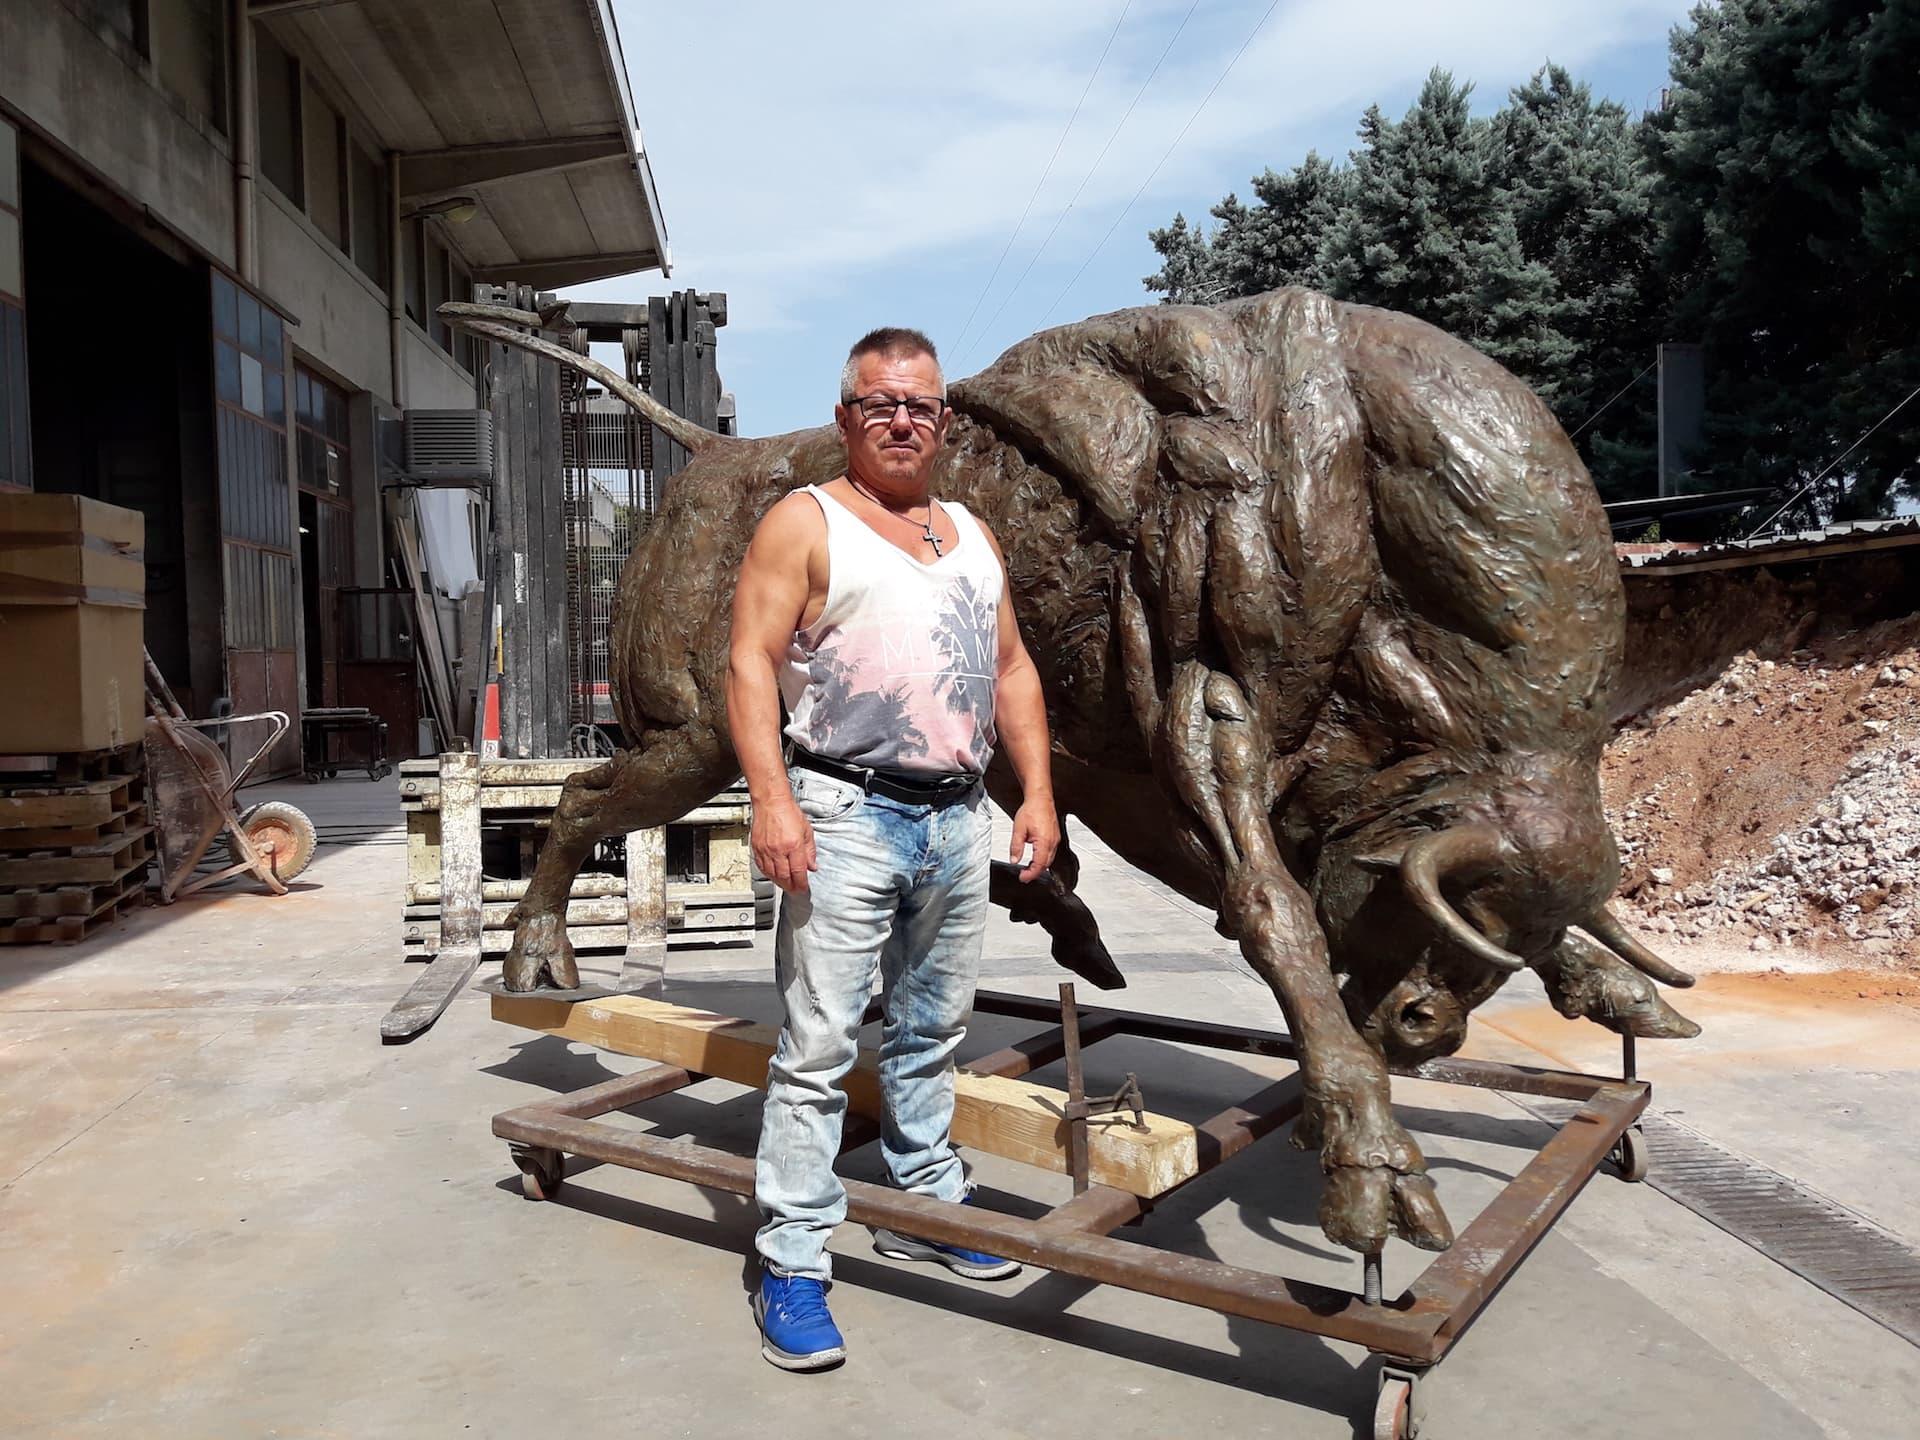 bronze-bull-custom-sculptures-large-life-size-statuette-for-sale-04